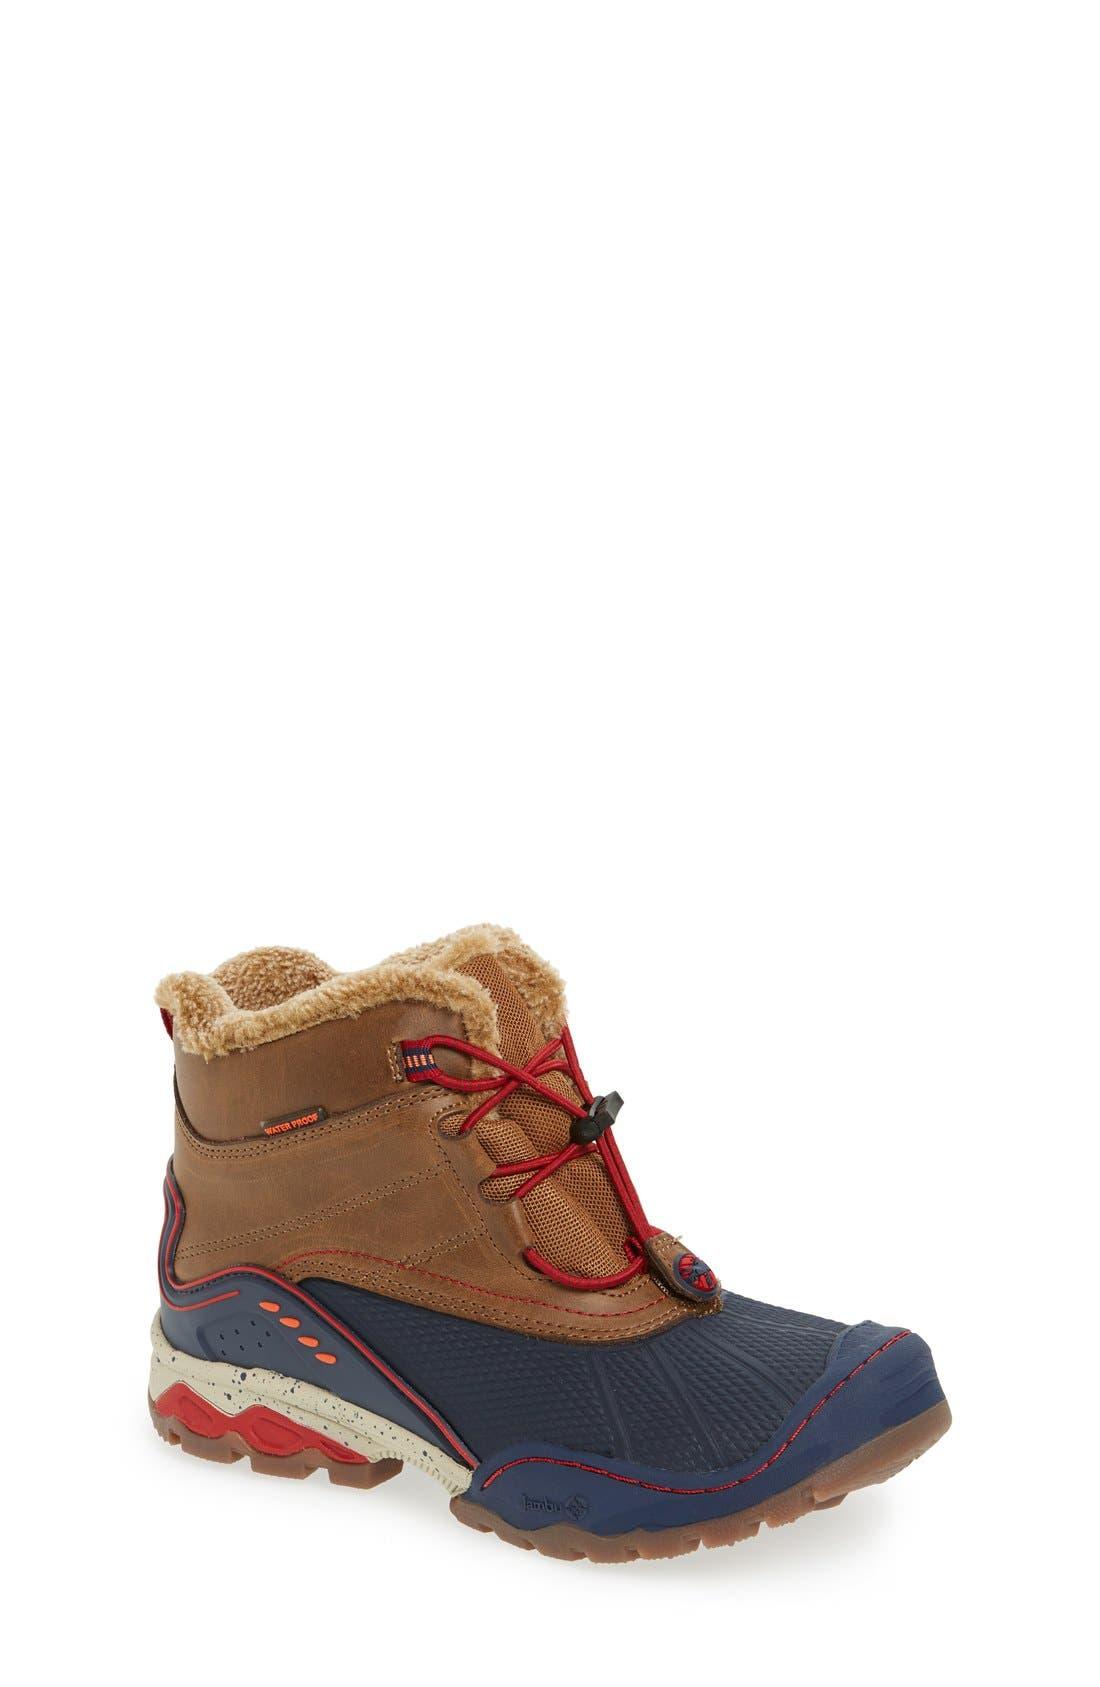 Jambu 'Baltoro 3' Waterproof Insulated Snow Boot (Toddler, Little Kid & Big Kid)